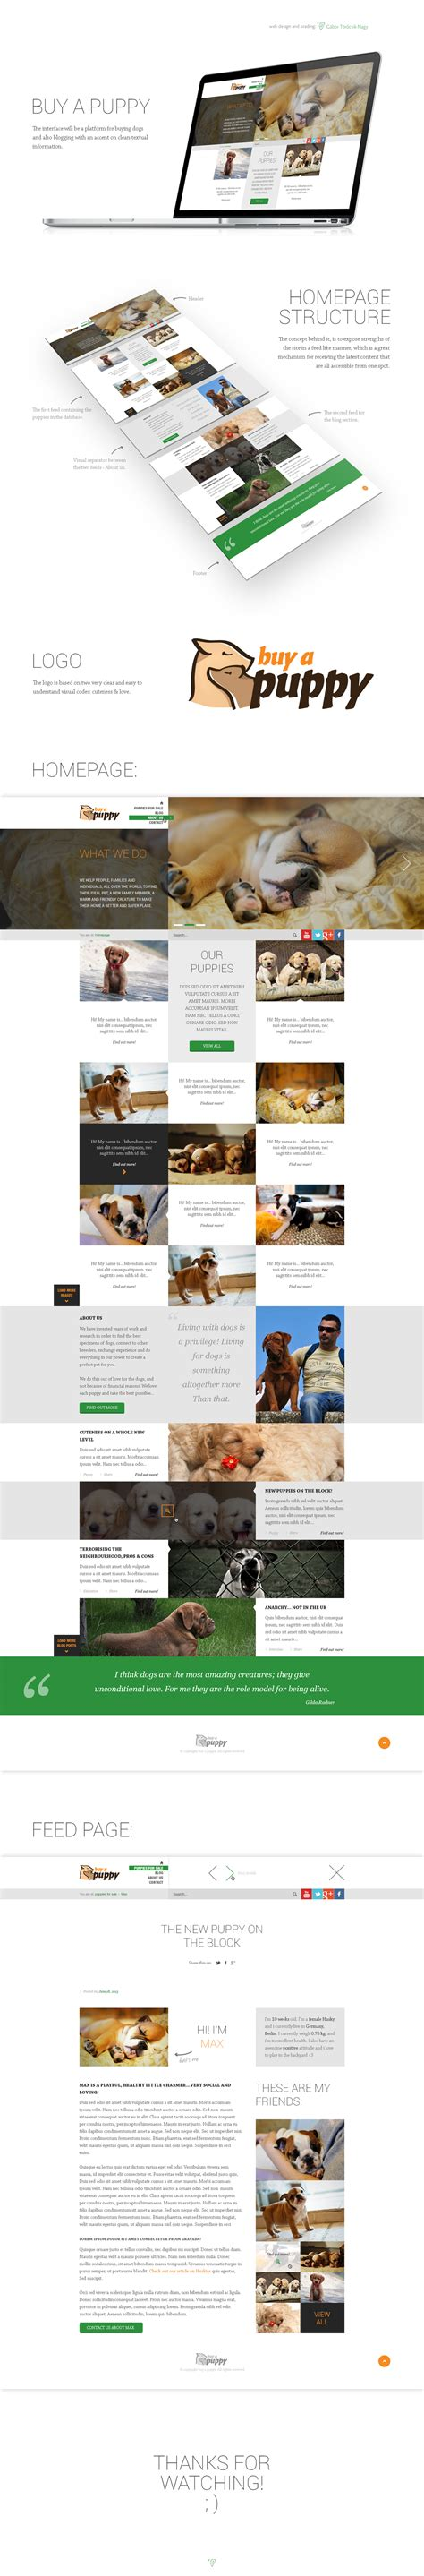 Web Design  Ee  Buy A Puppy Ee   By Tngabor On Deviantart